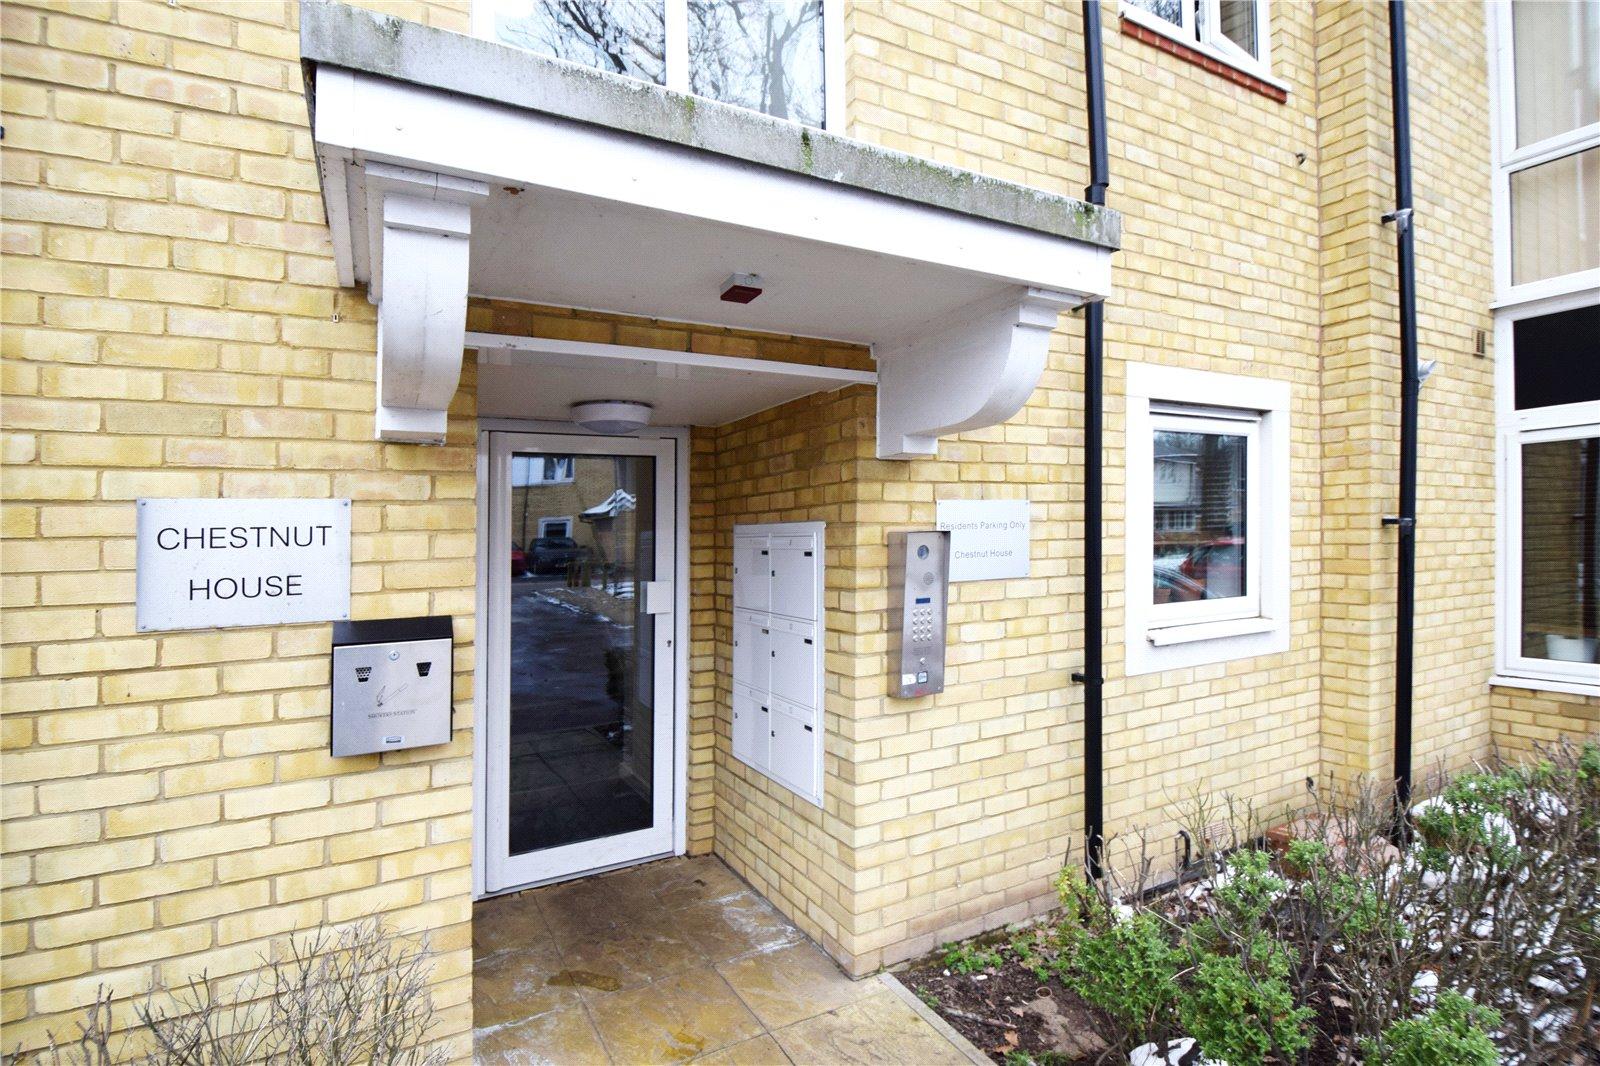 Chestnut House, Squirrels Close, Swanley, Kent, BR8